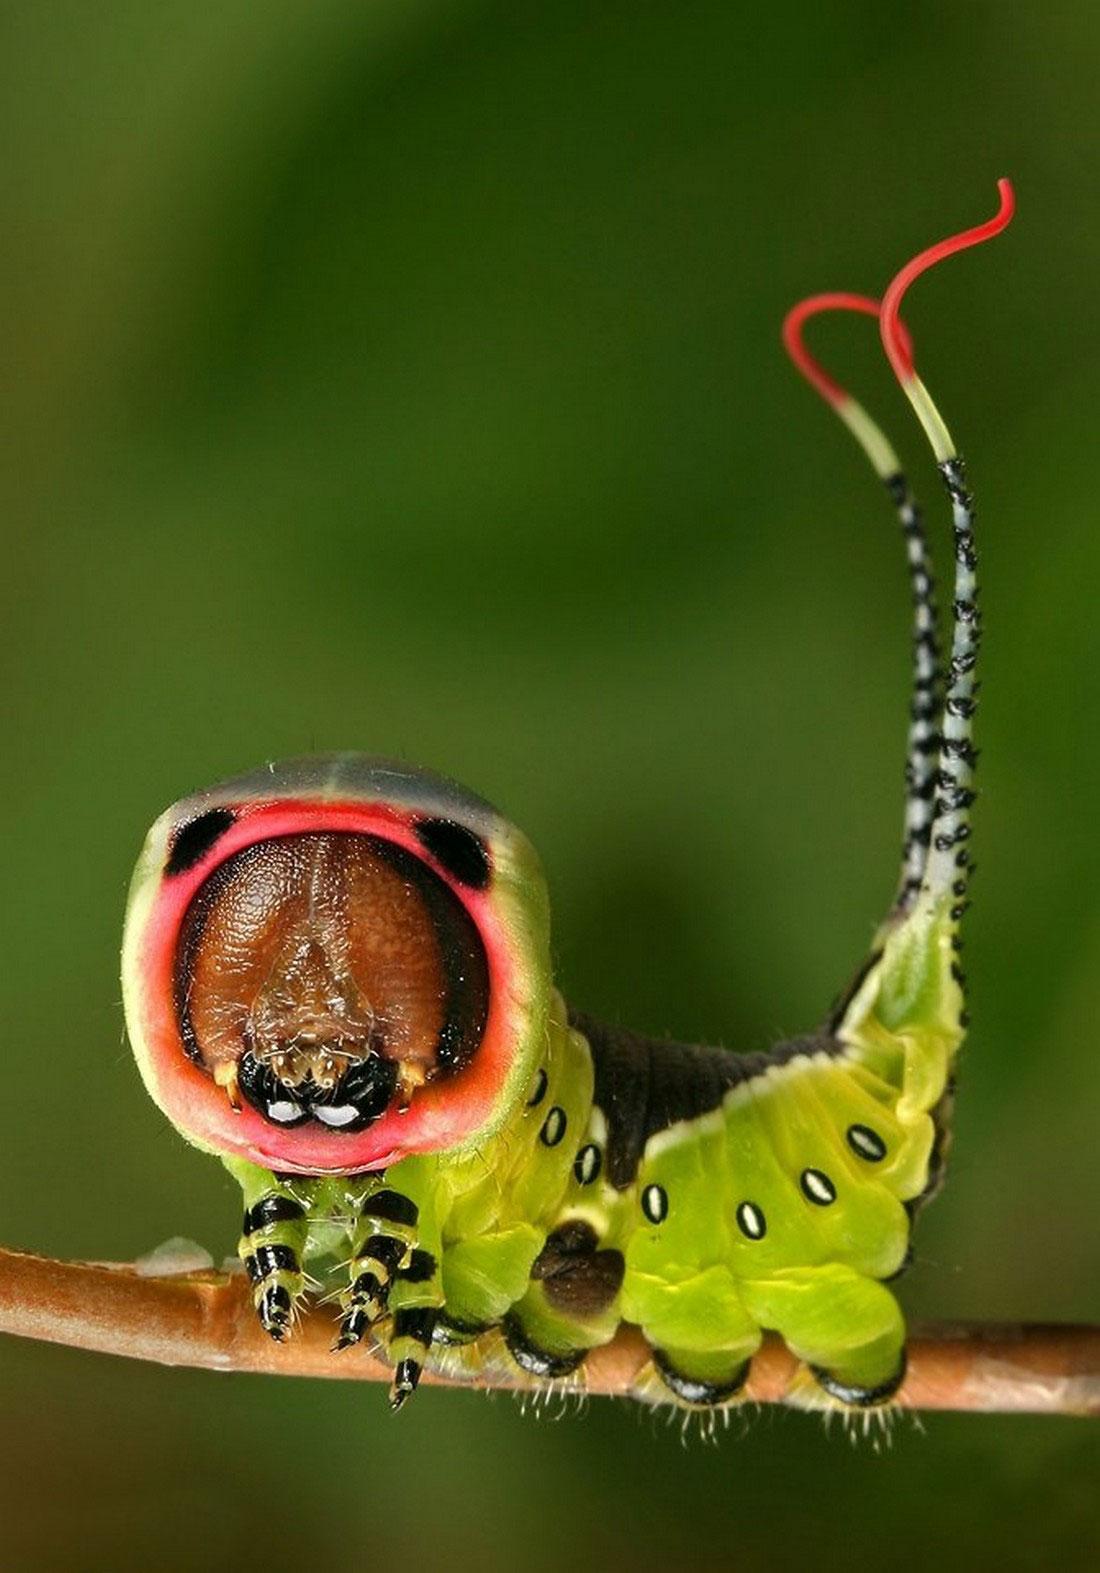 гусеница зеленая, фото